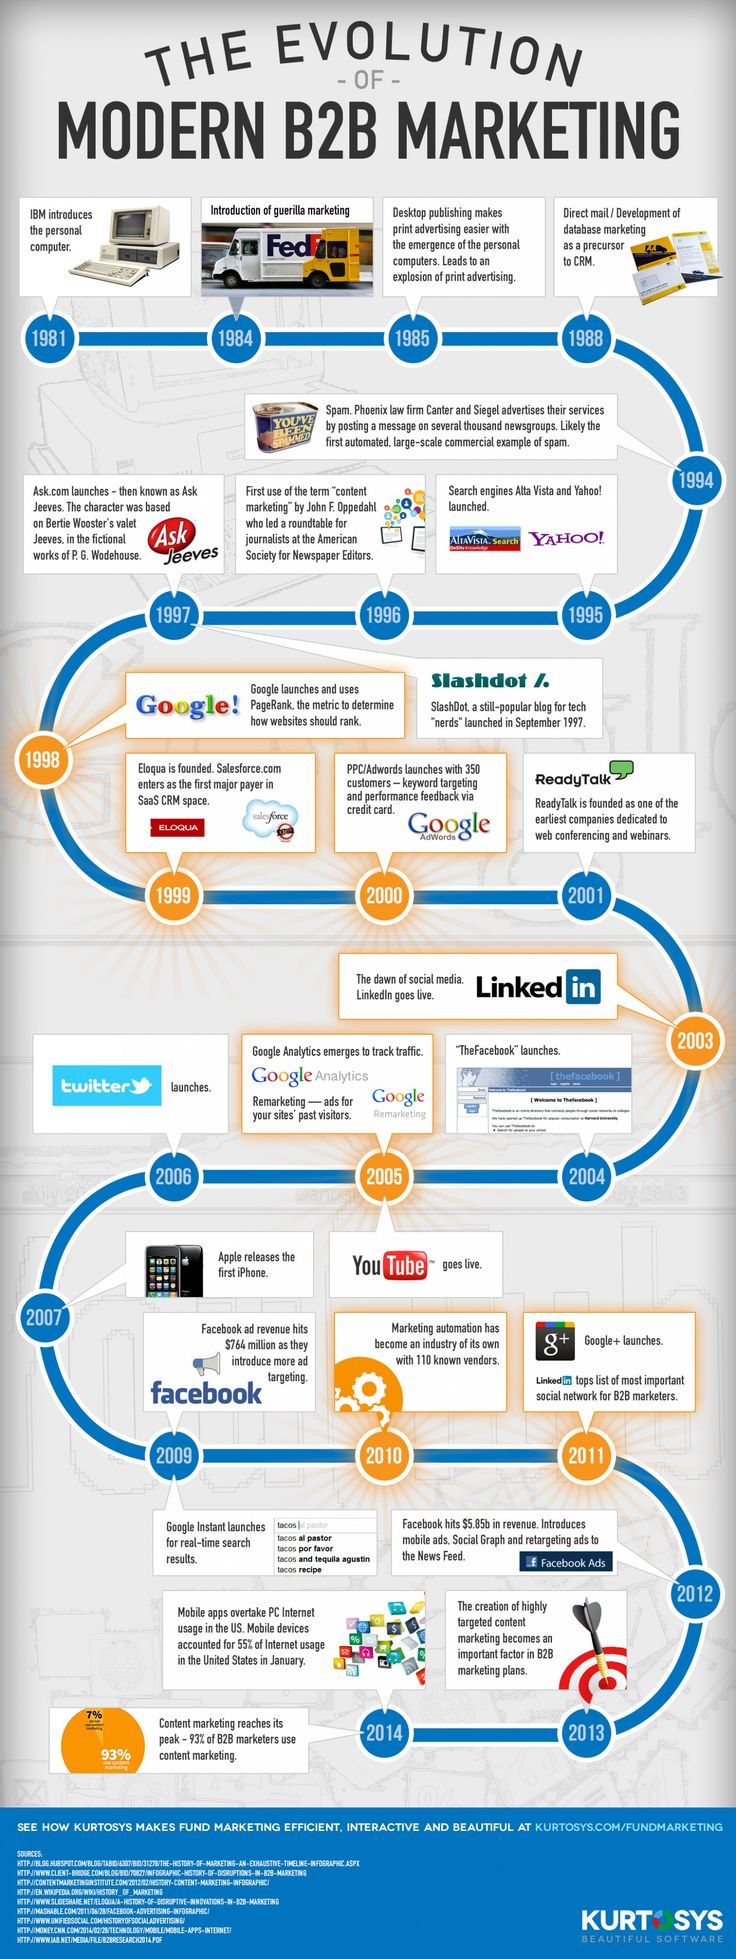 The Evolution of Modern B2B Marketing